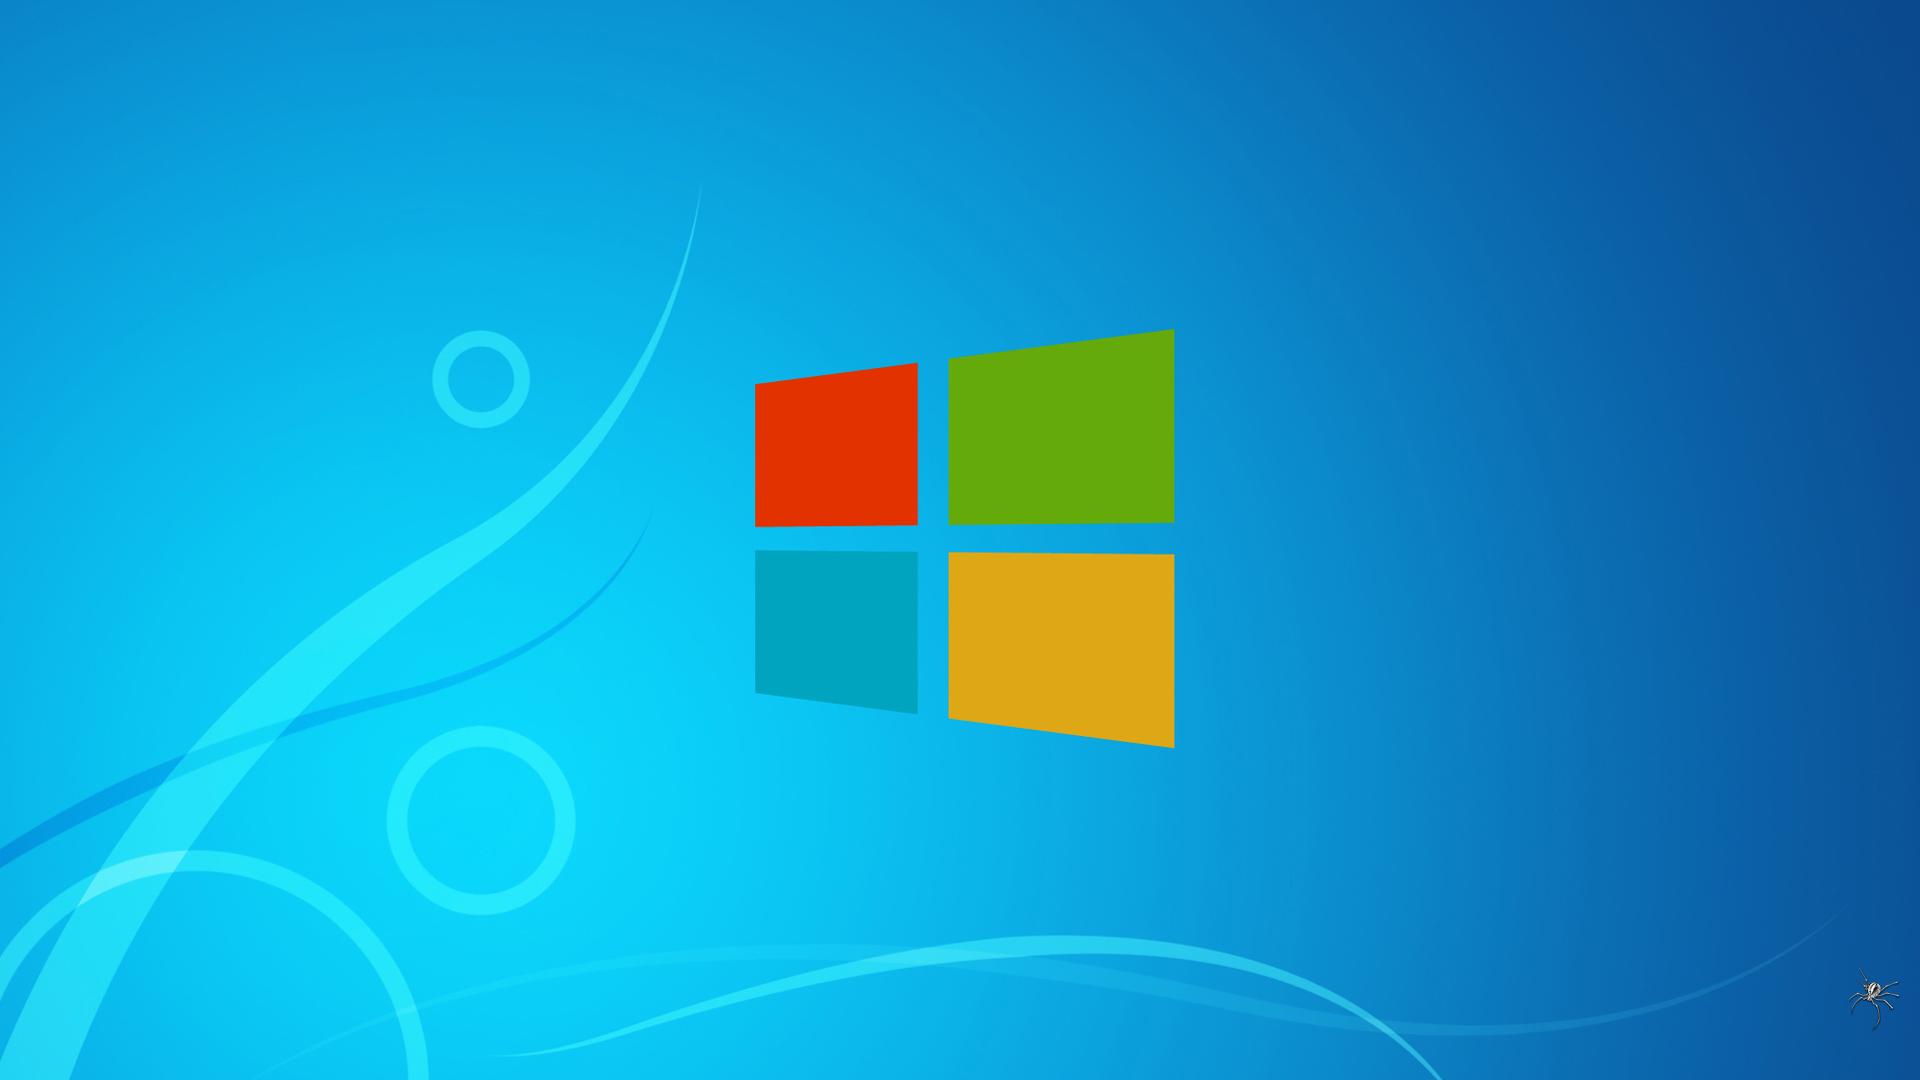 Windows 8 wallpaper 1920x1080   hebusorg   High Definition Wallpapers 1920x1080